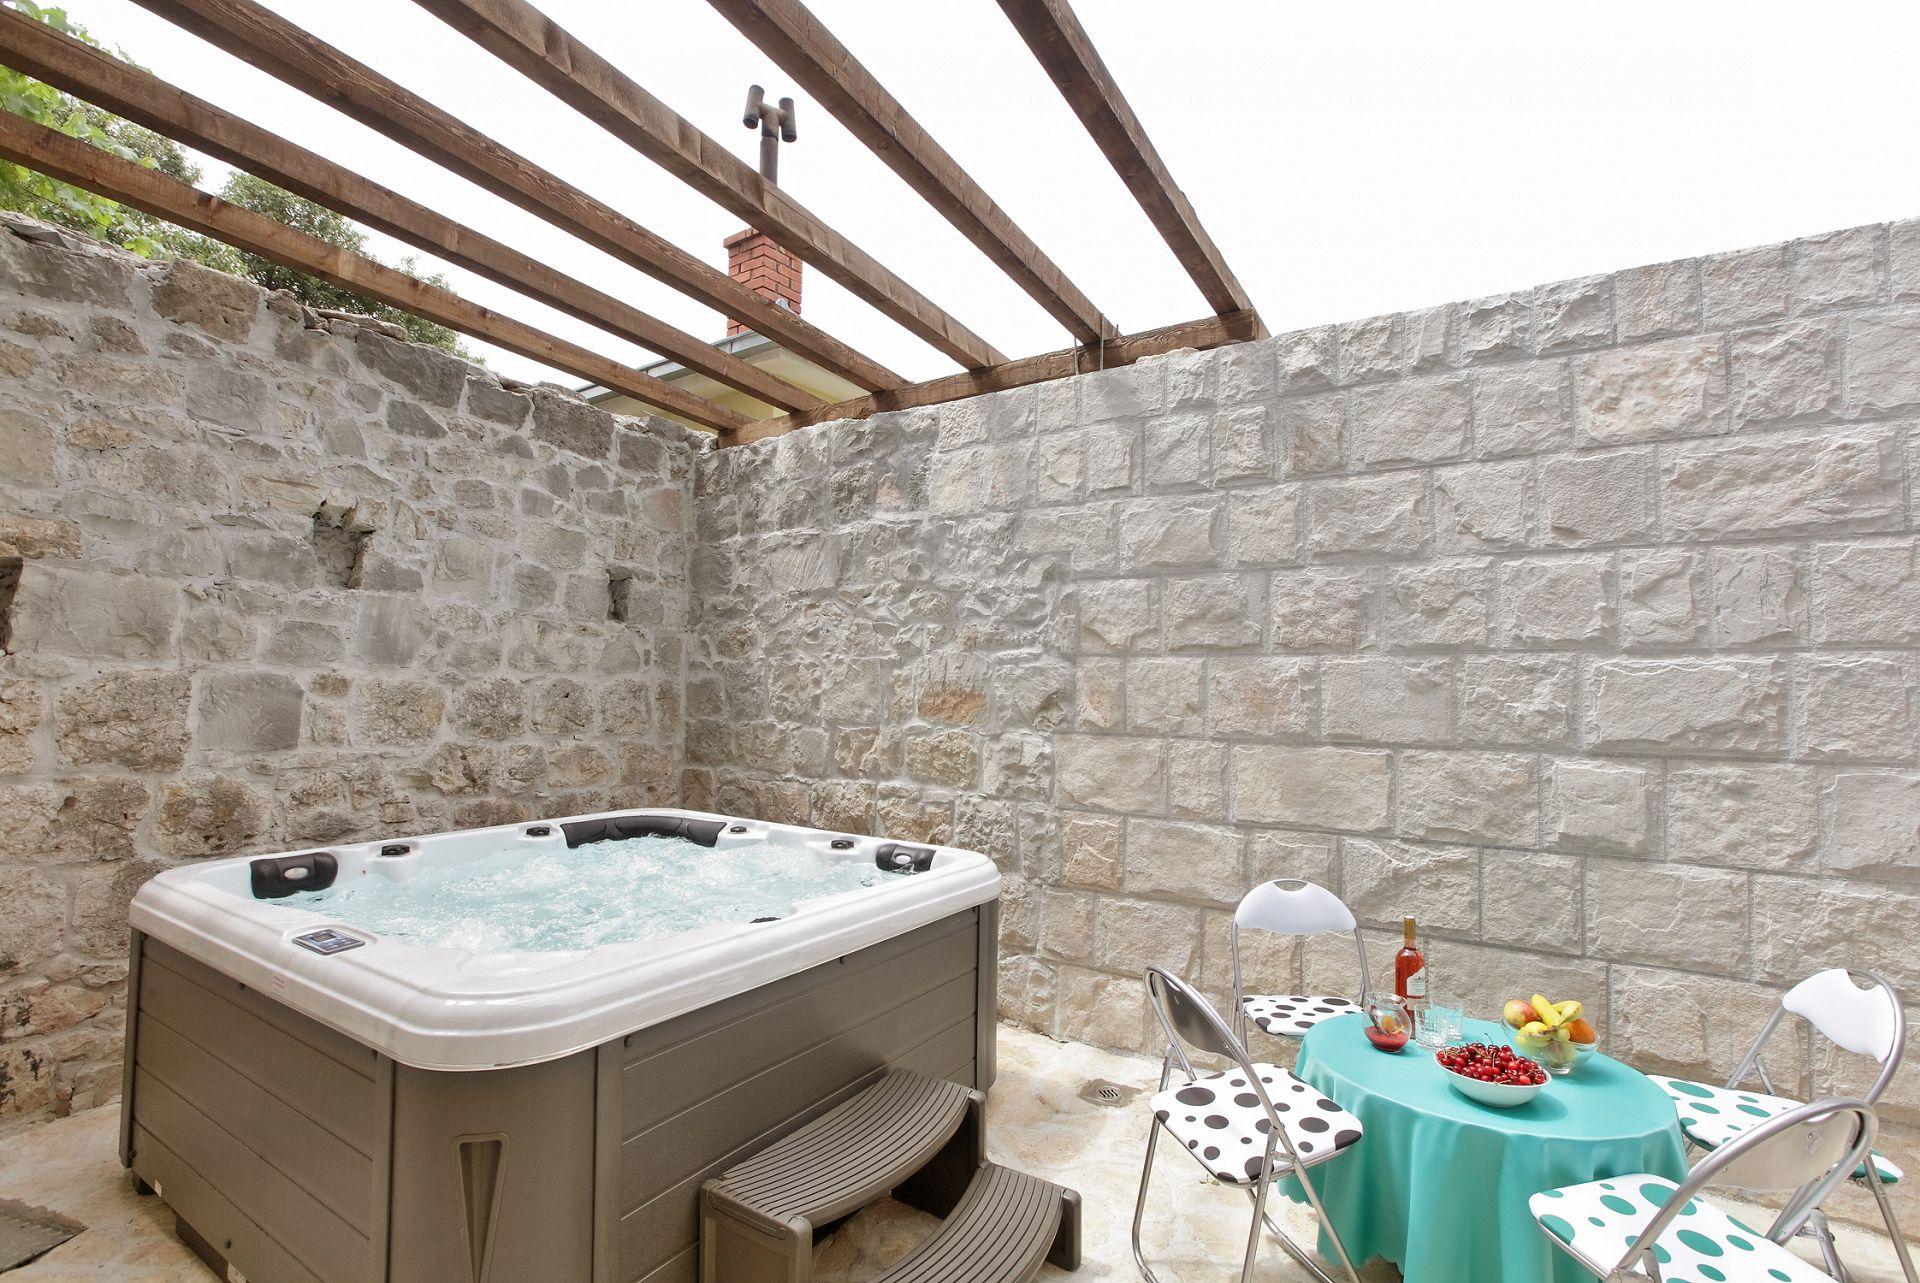 35908 - Solin - Vakantiehuizen, villa´s Kroatië